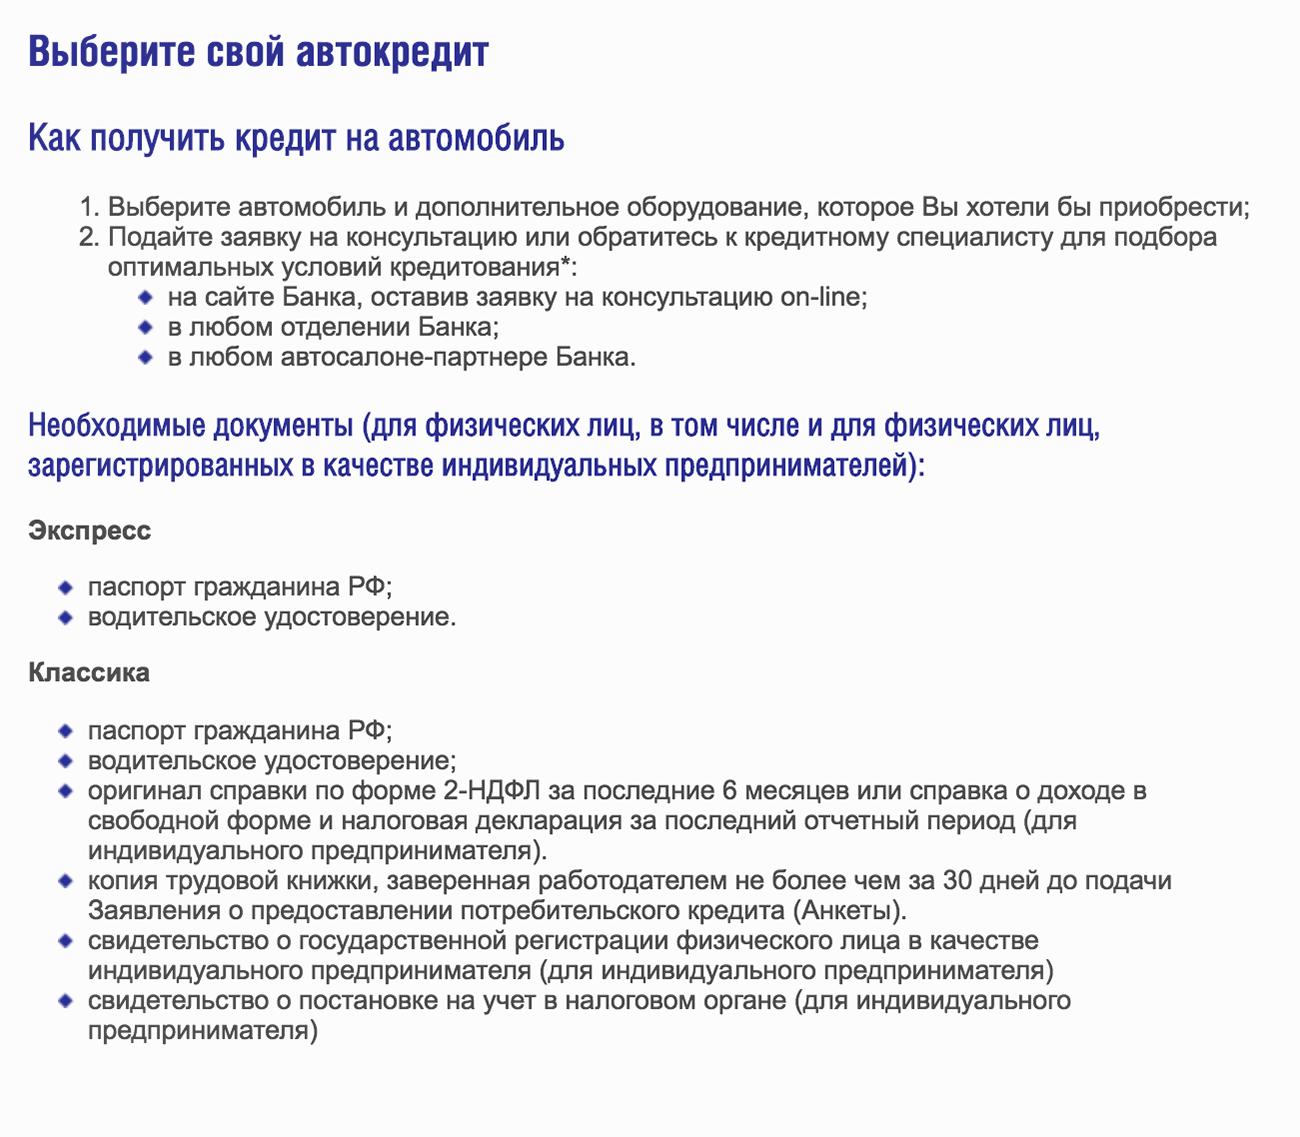 Как взять кредит на банке на ип сбербанк иркутск кредит под залог недвижимости